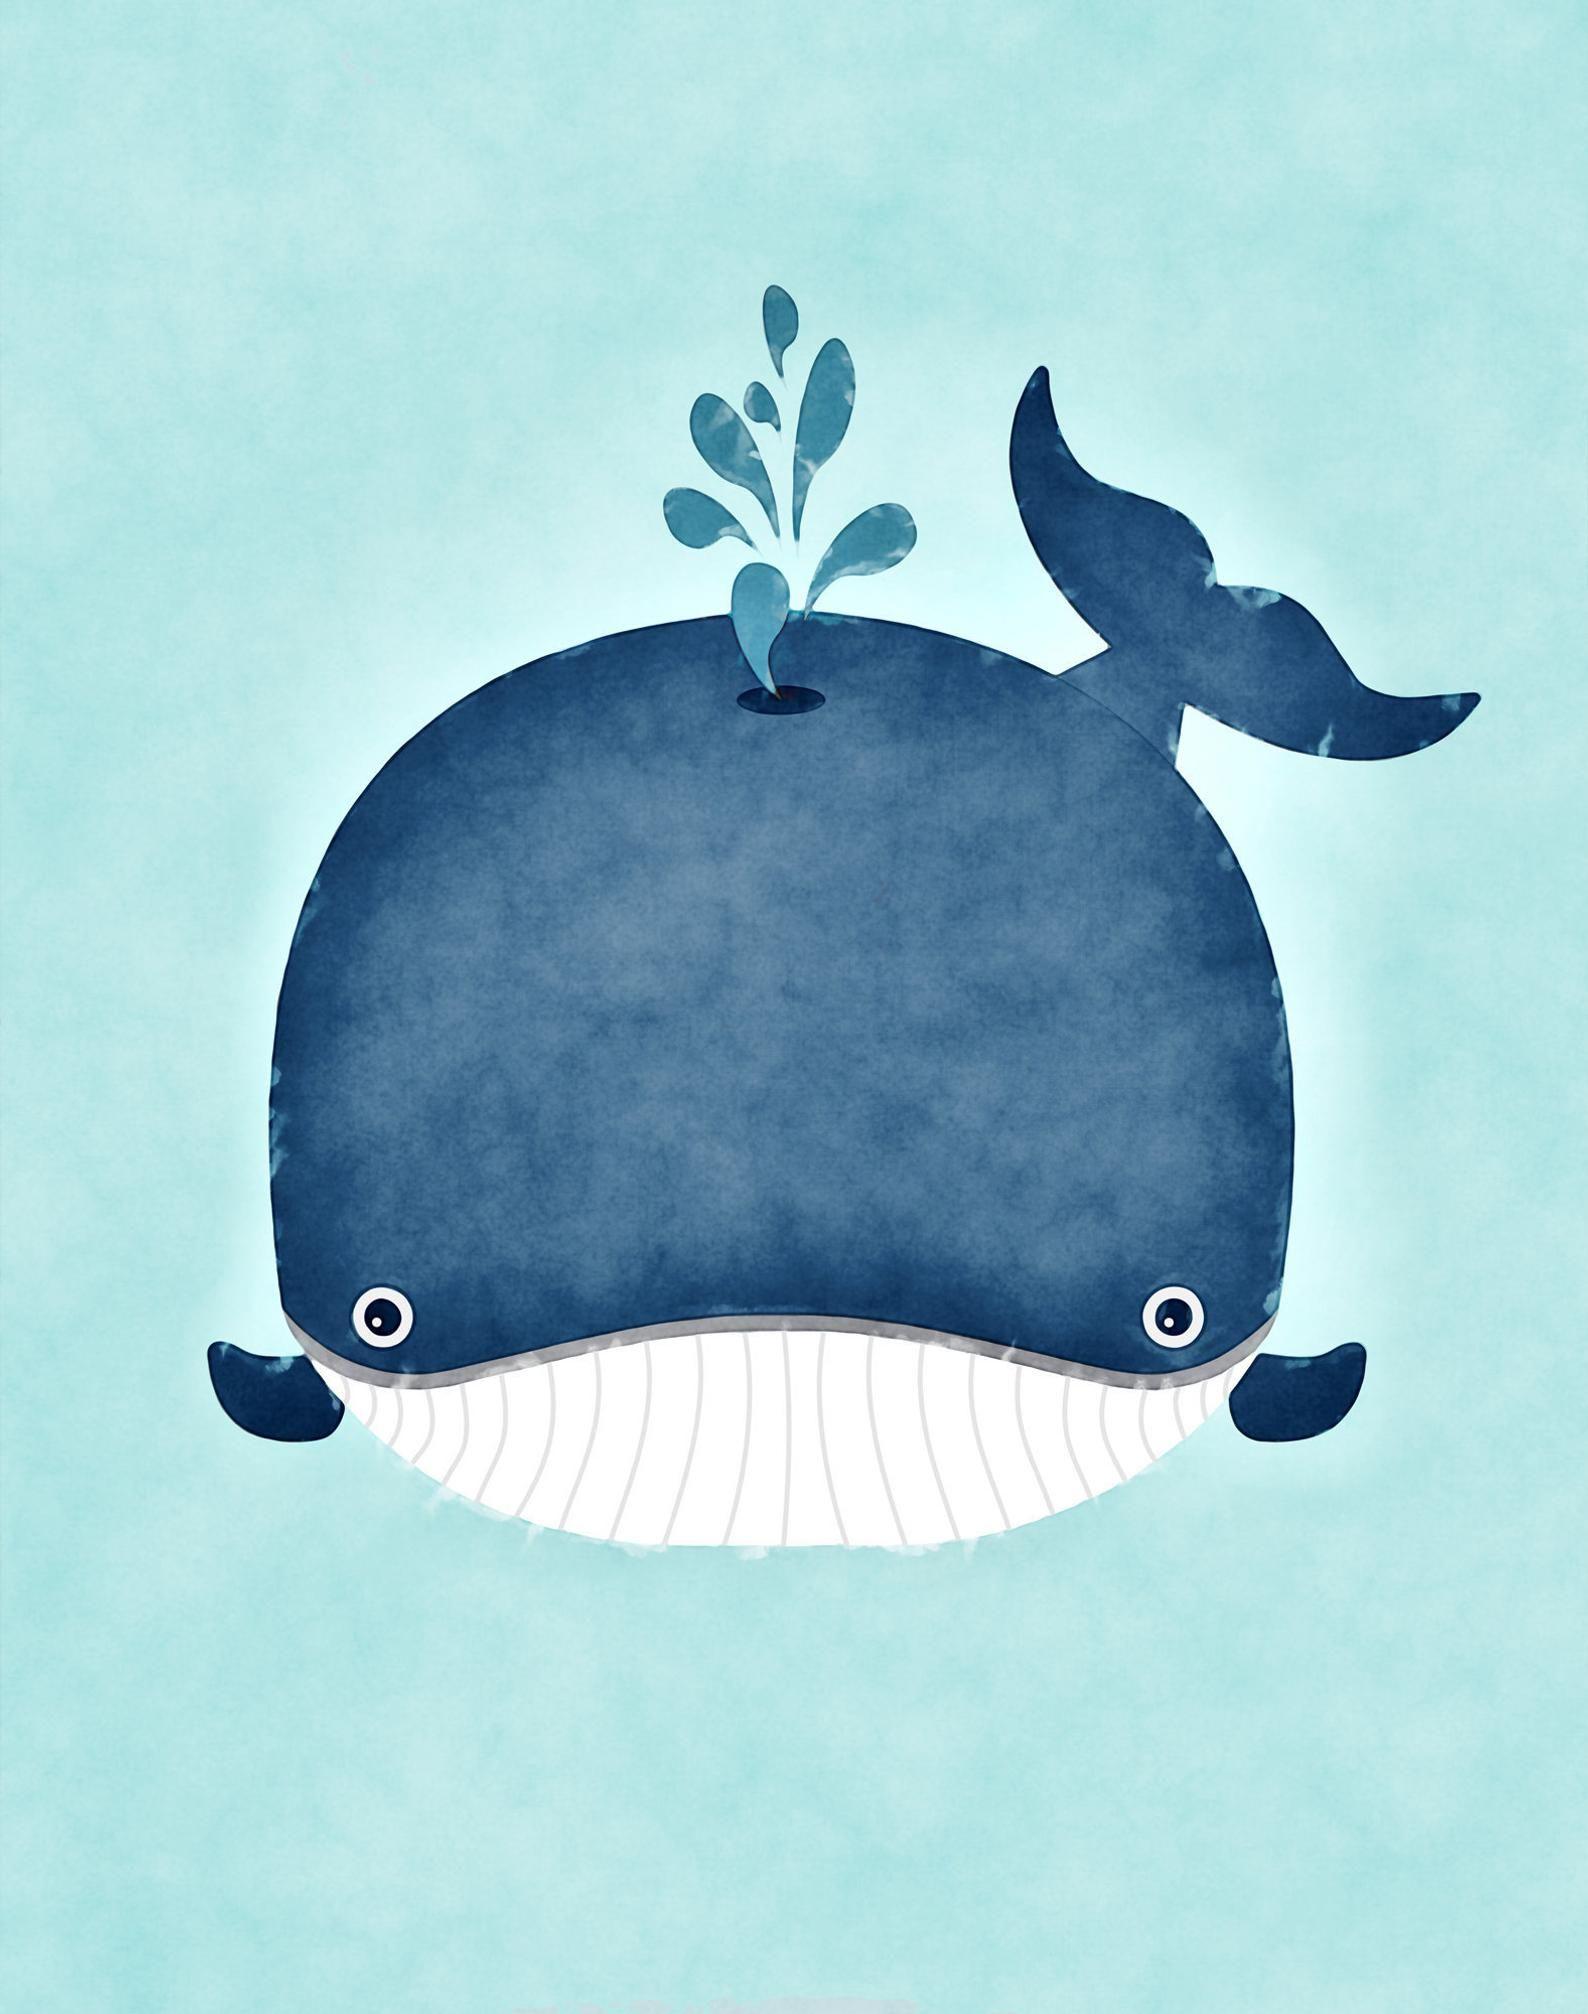 Whale Nursery / Whale Nursery Decor / Whale Print / Whale | Etsy